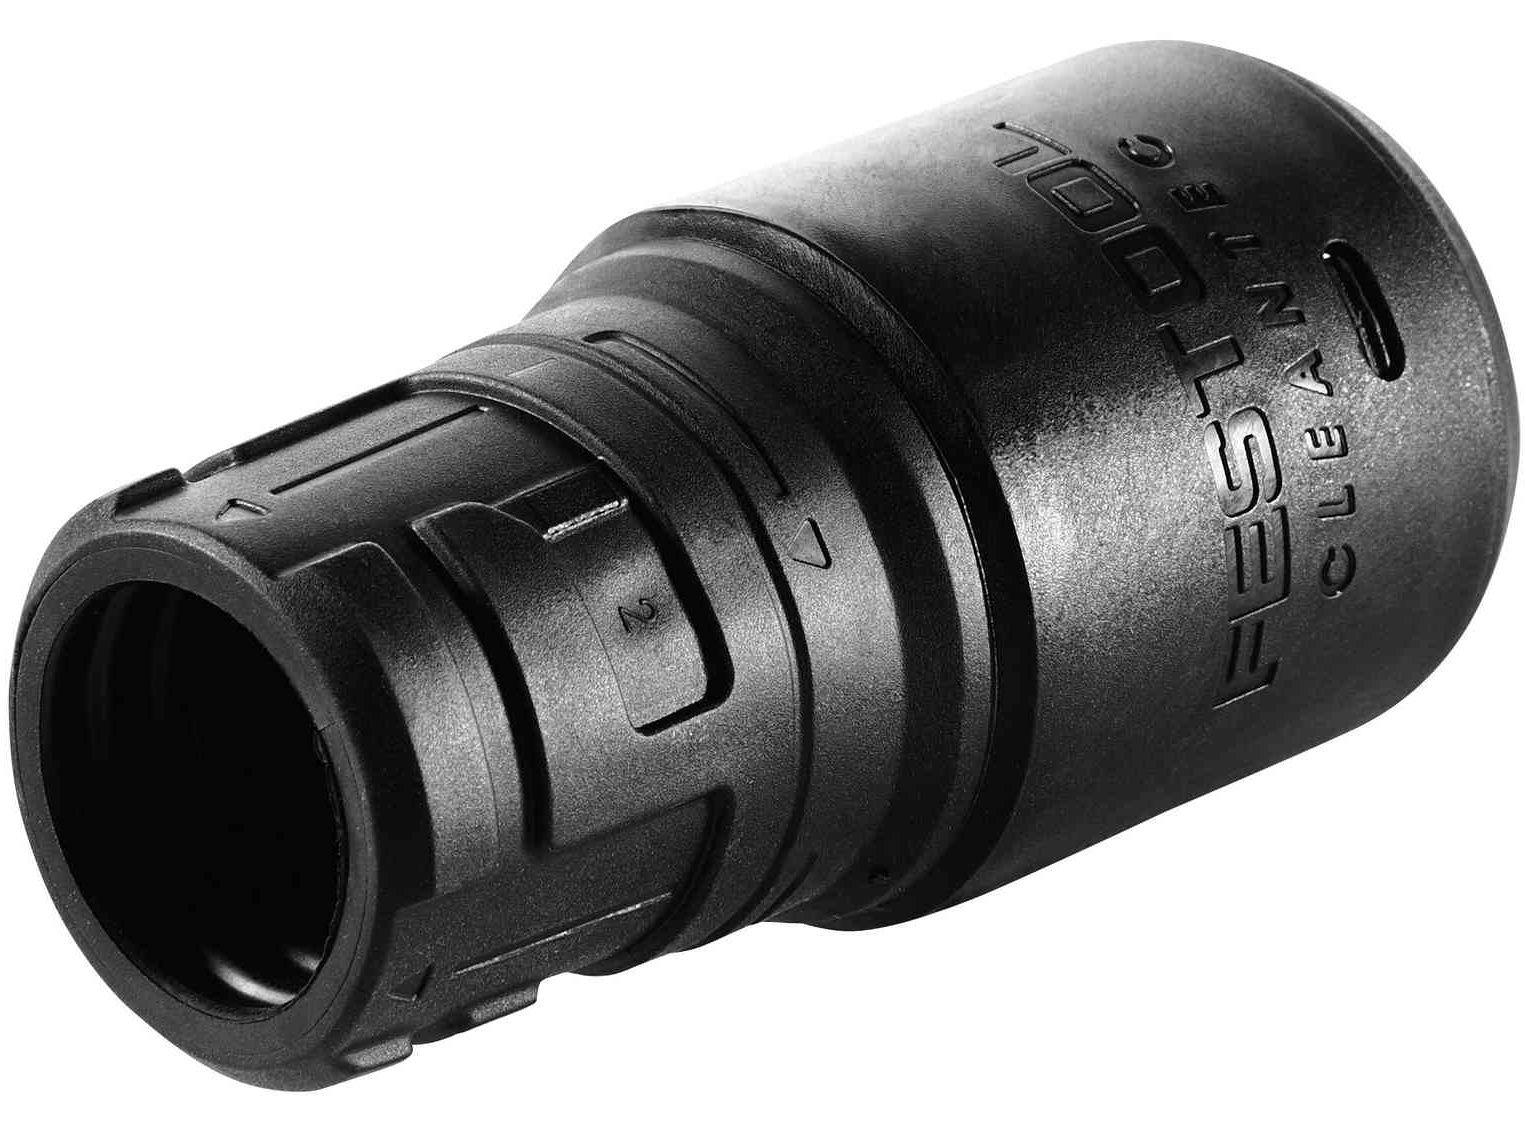 Spojovací objímka pro sací hadice Festool D 27 - 27mm (Festool D 27 DM-AS/CT), kód: 202346